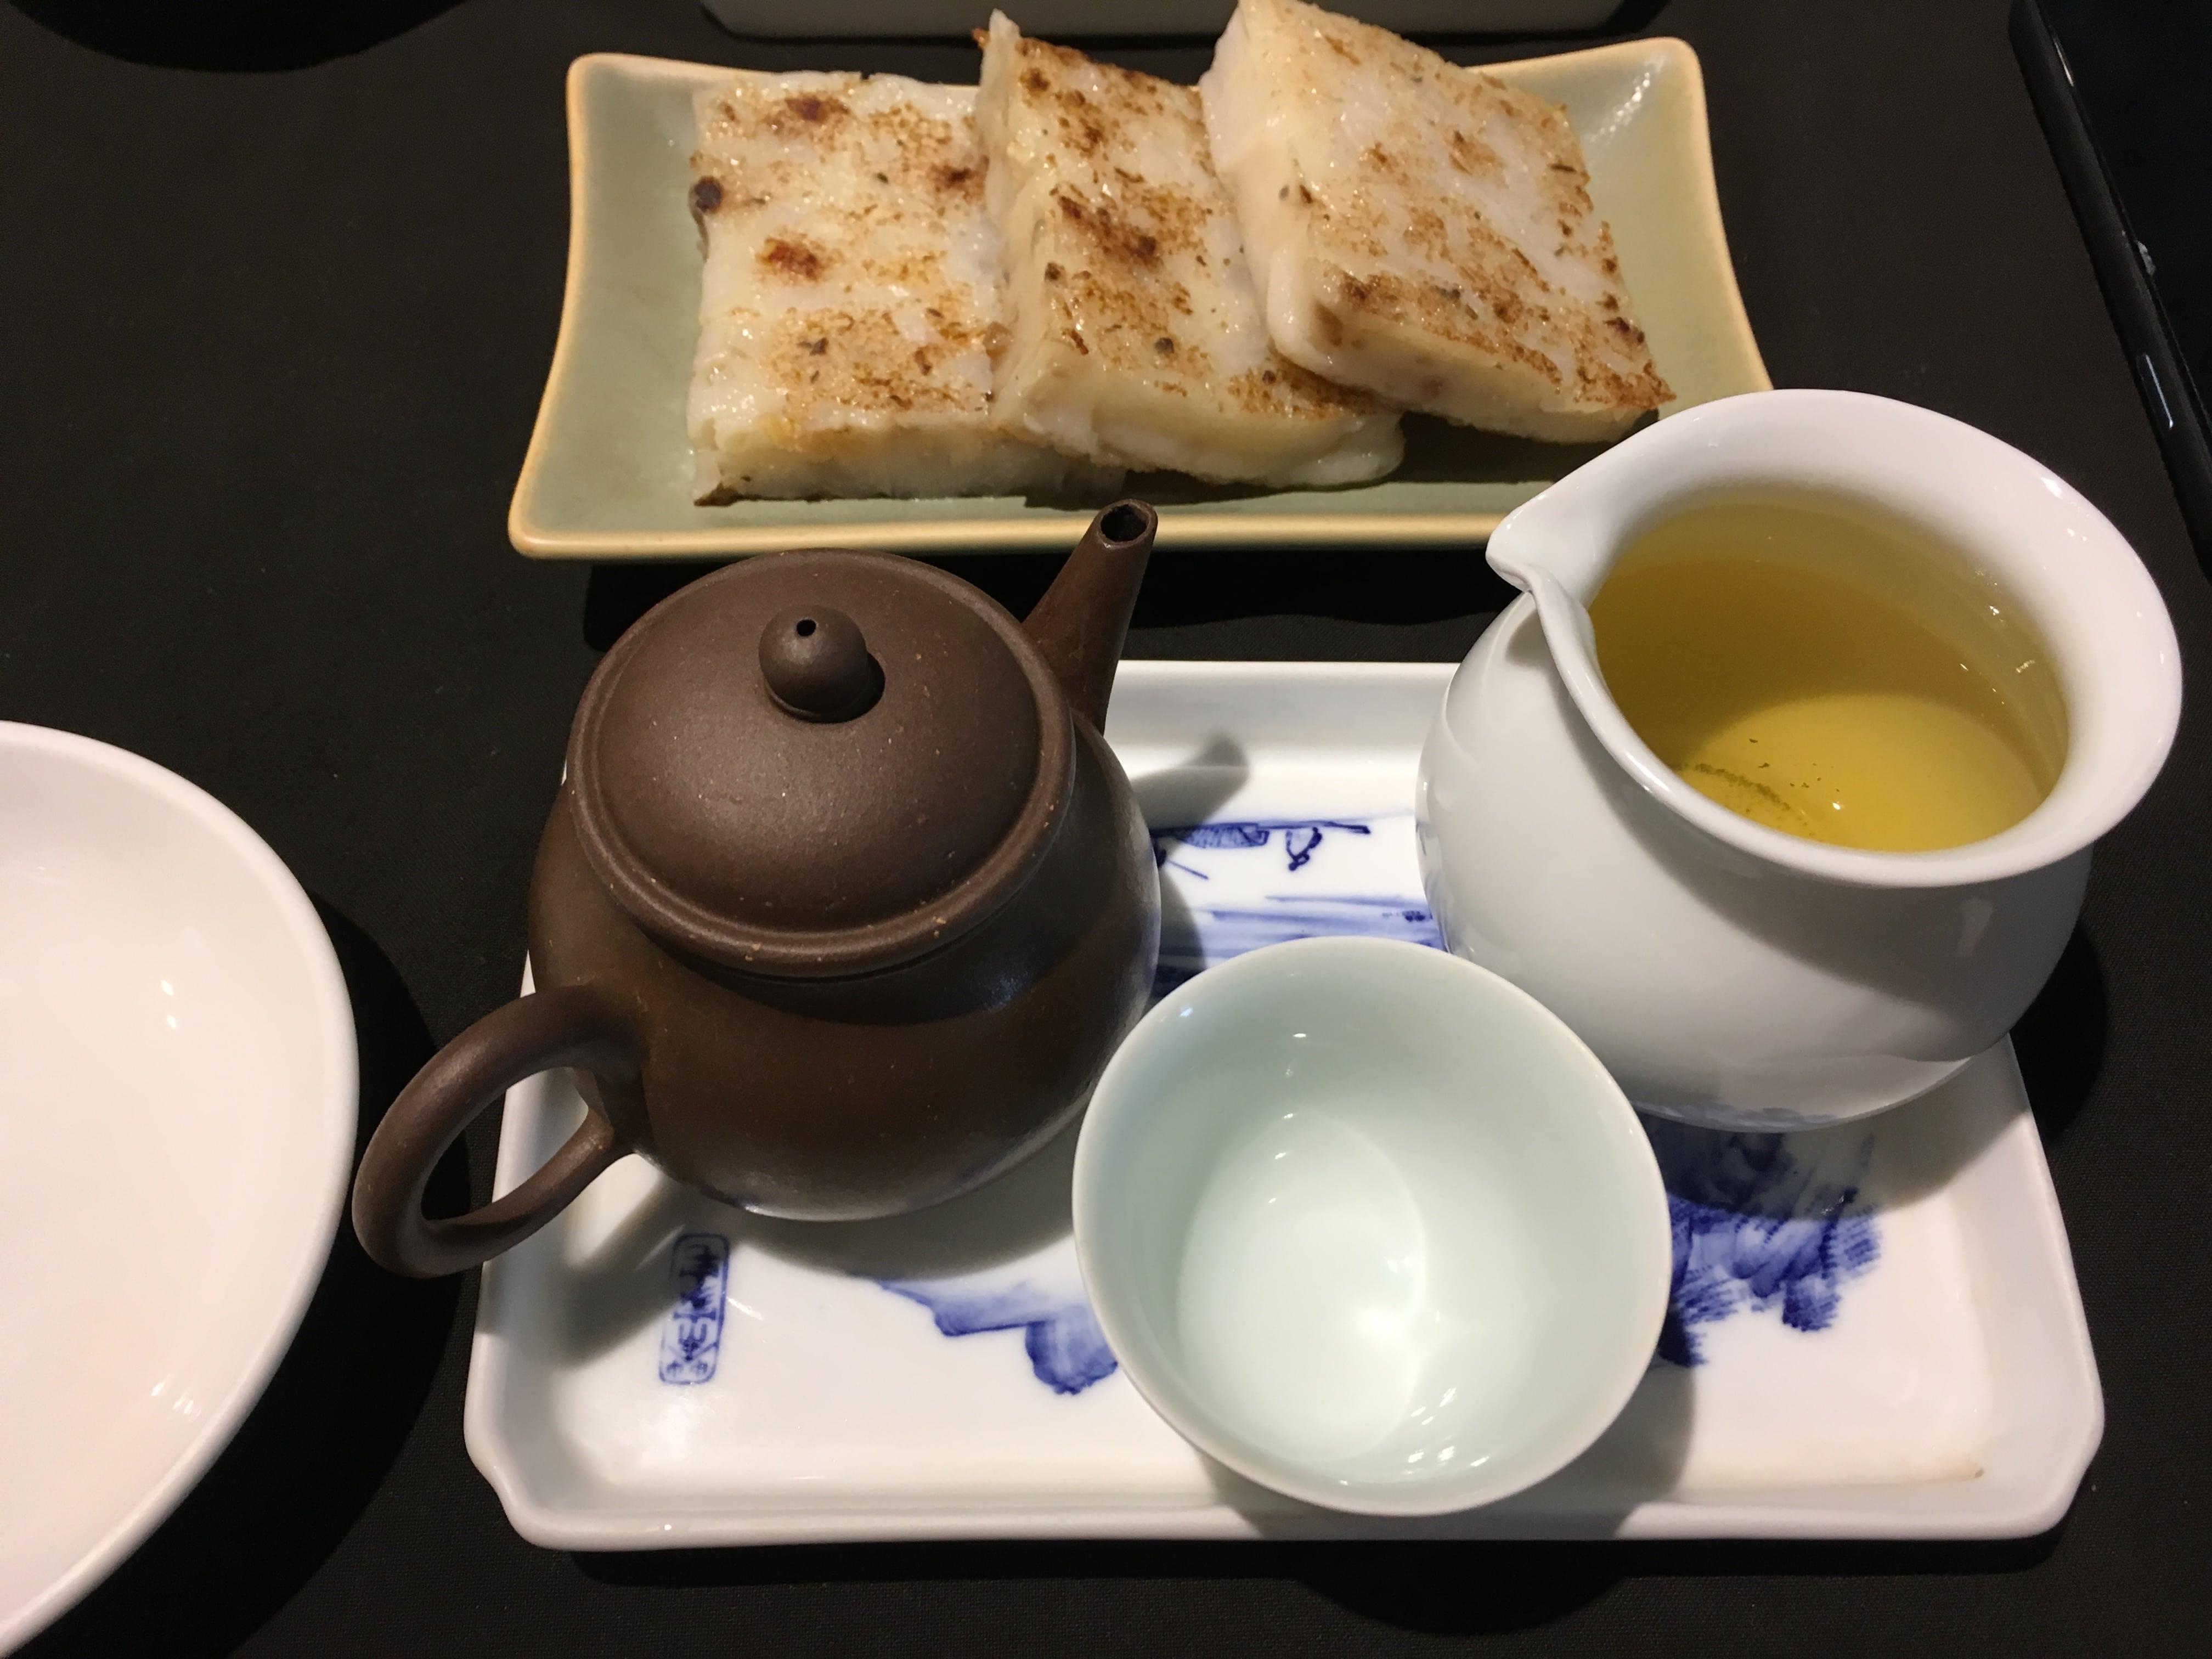 Hongkong_Heritage_TeaHouse_Dimsums_TeaVoyages